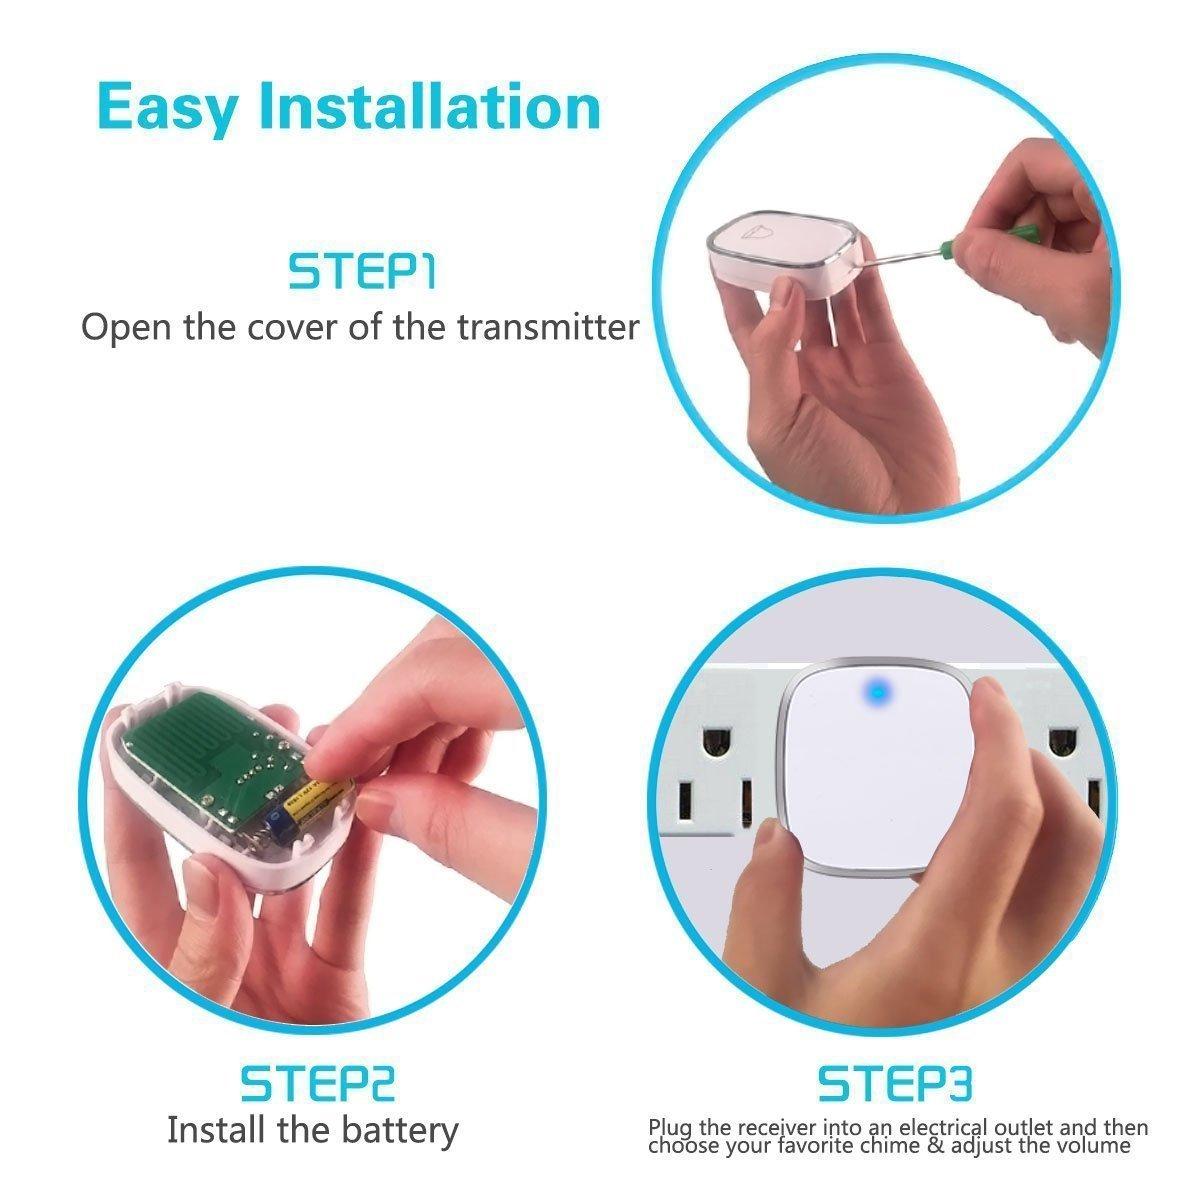 Timbre Inalámbrico,IPSmart Kit de Timbre inalámbrico Exterior Impermeable 3 Transmisor y 2 Receptores Timbre Plug-in sin Hilos a un Rango de 900ft de ...